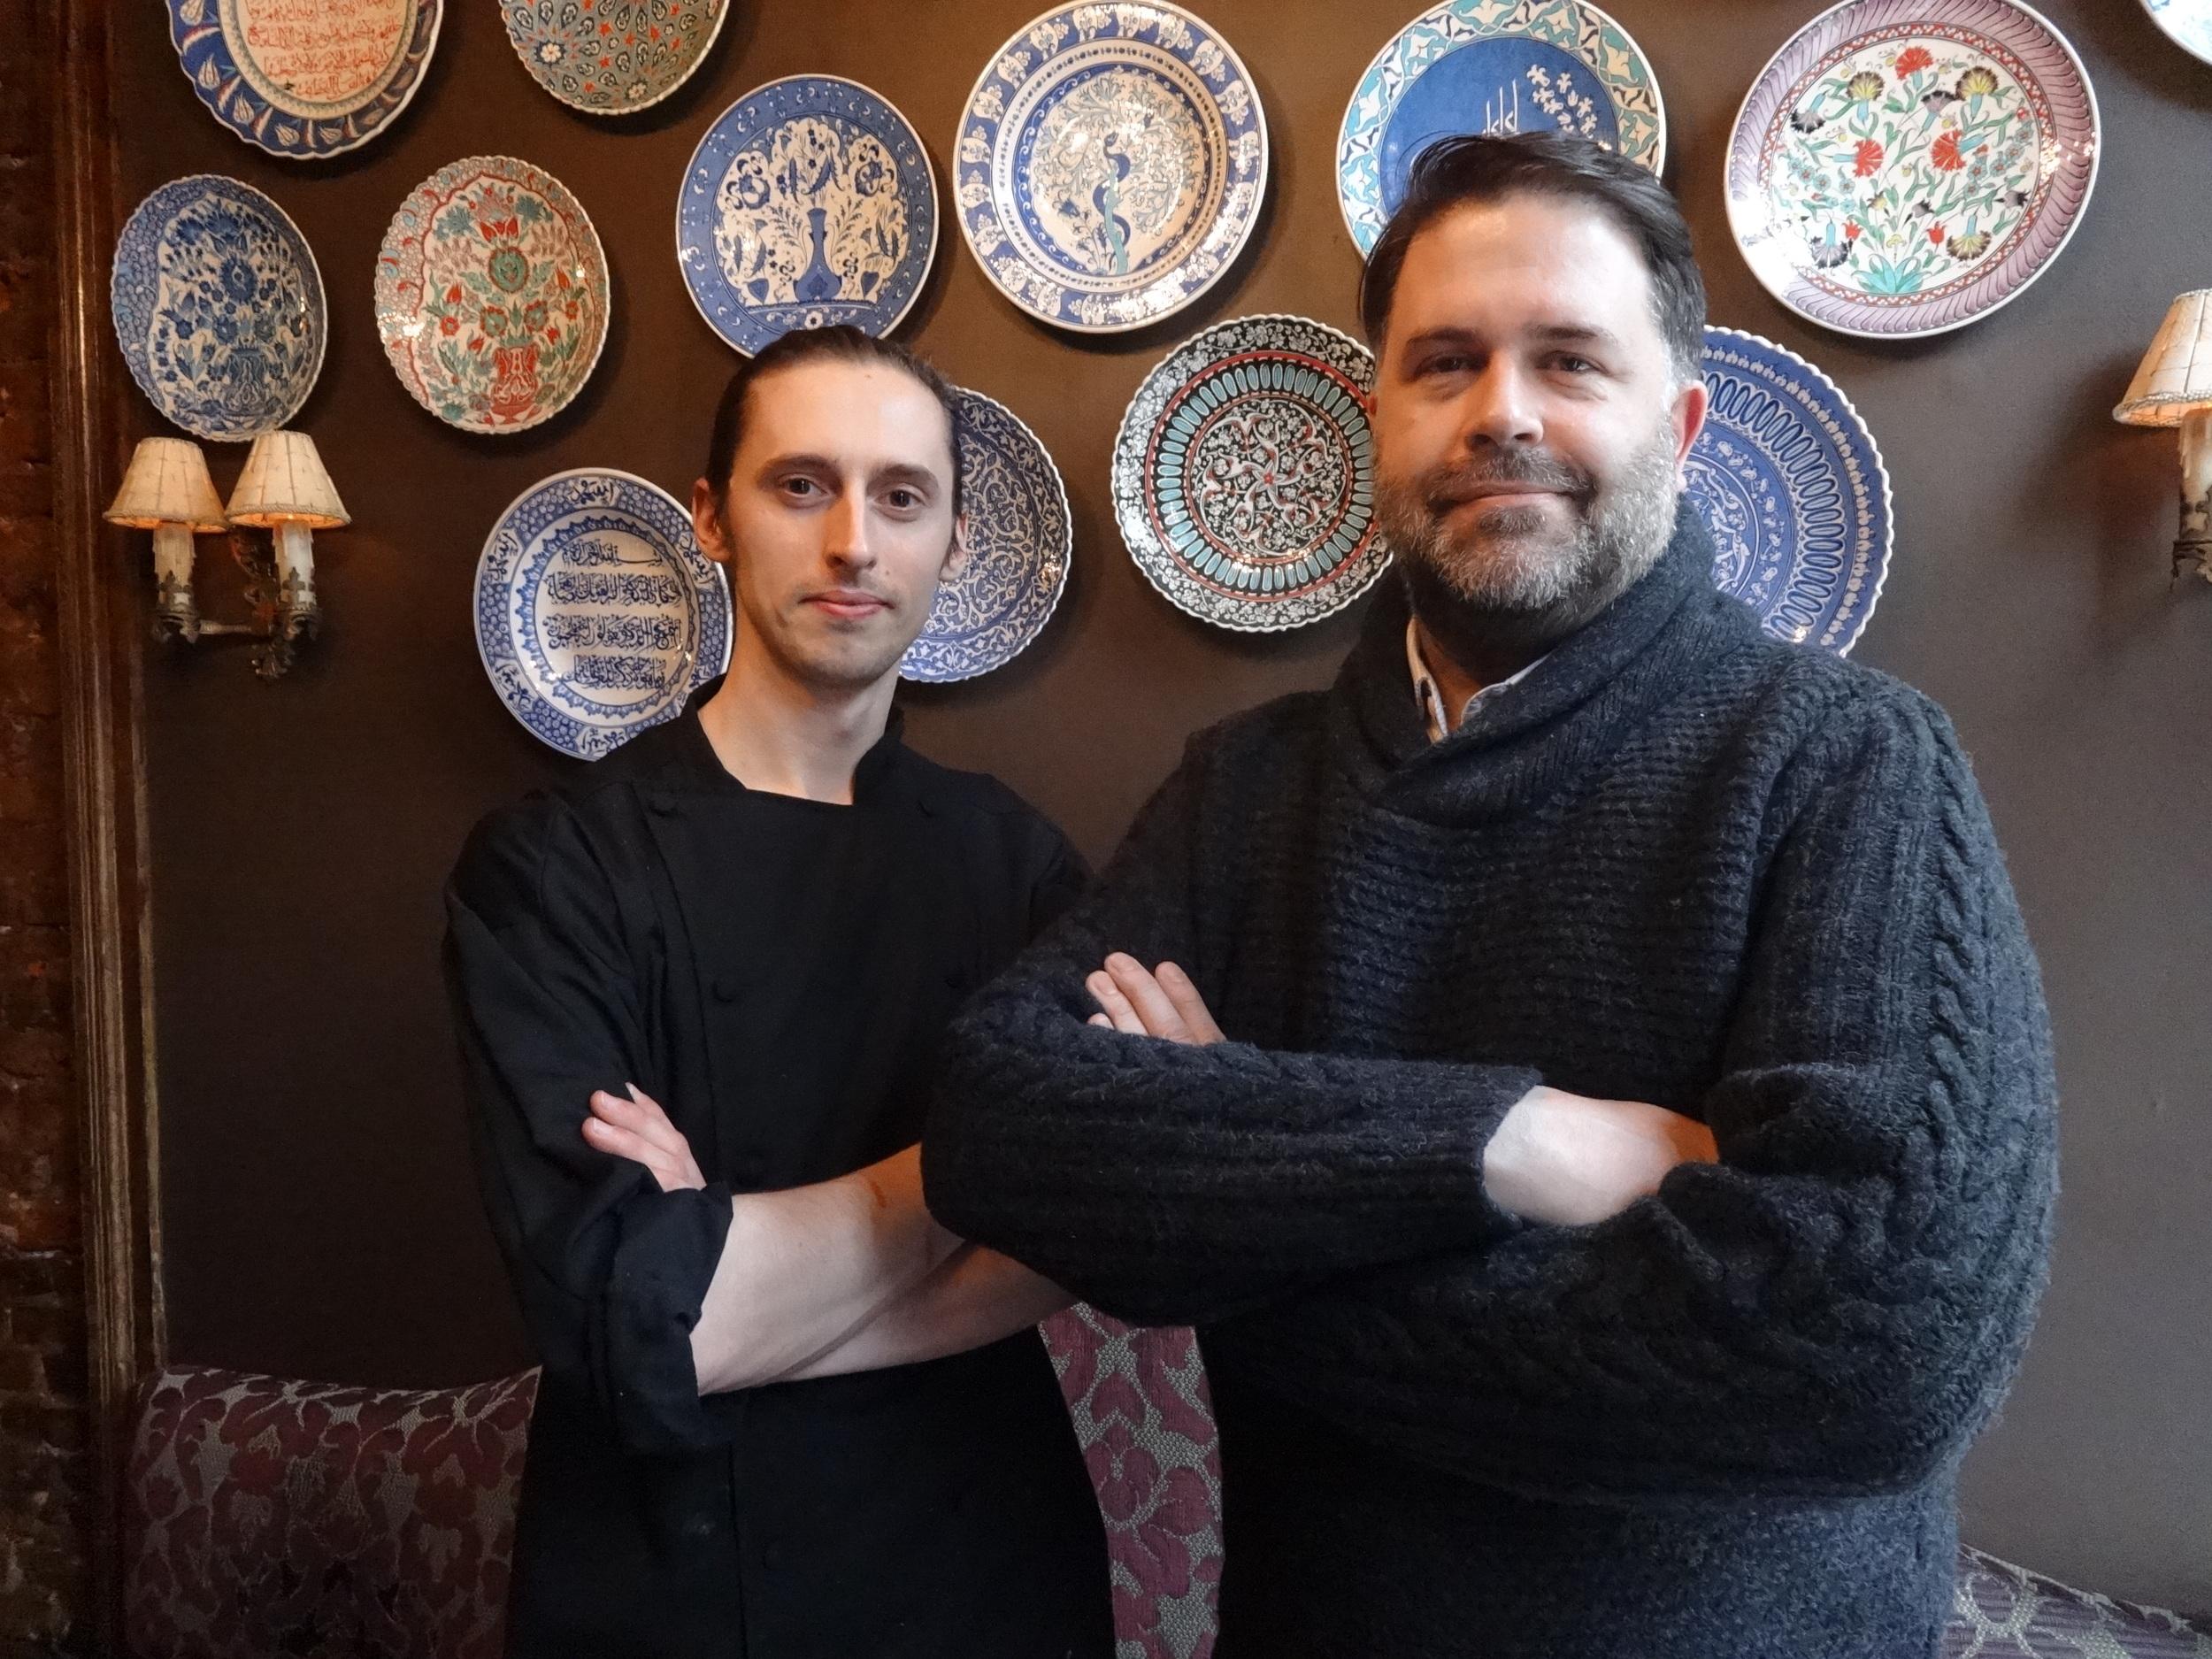 Donal McCoy, Matthew Daggett, Serrano, Restaurant, Old City